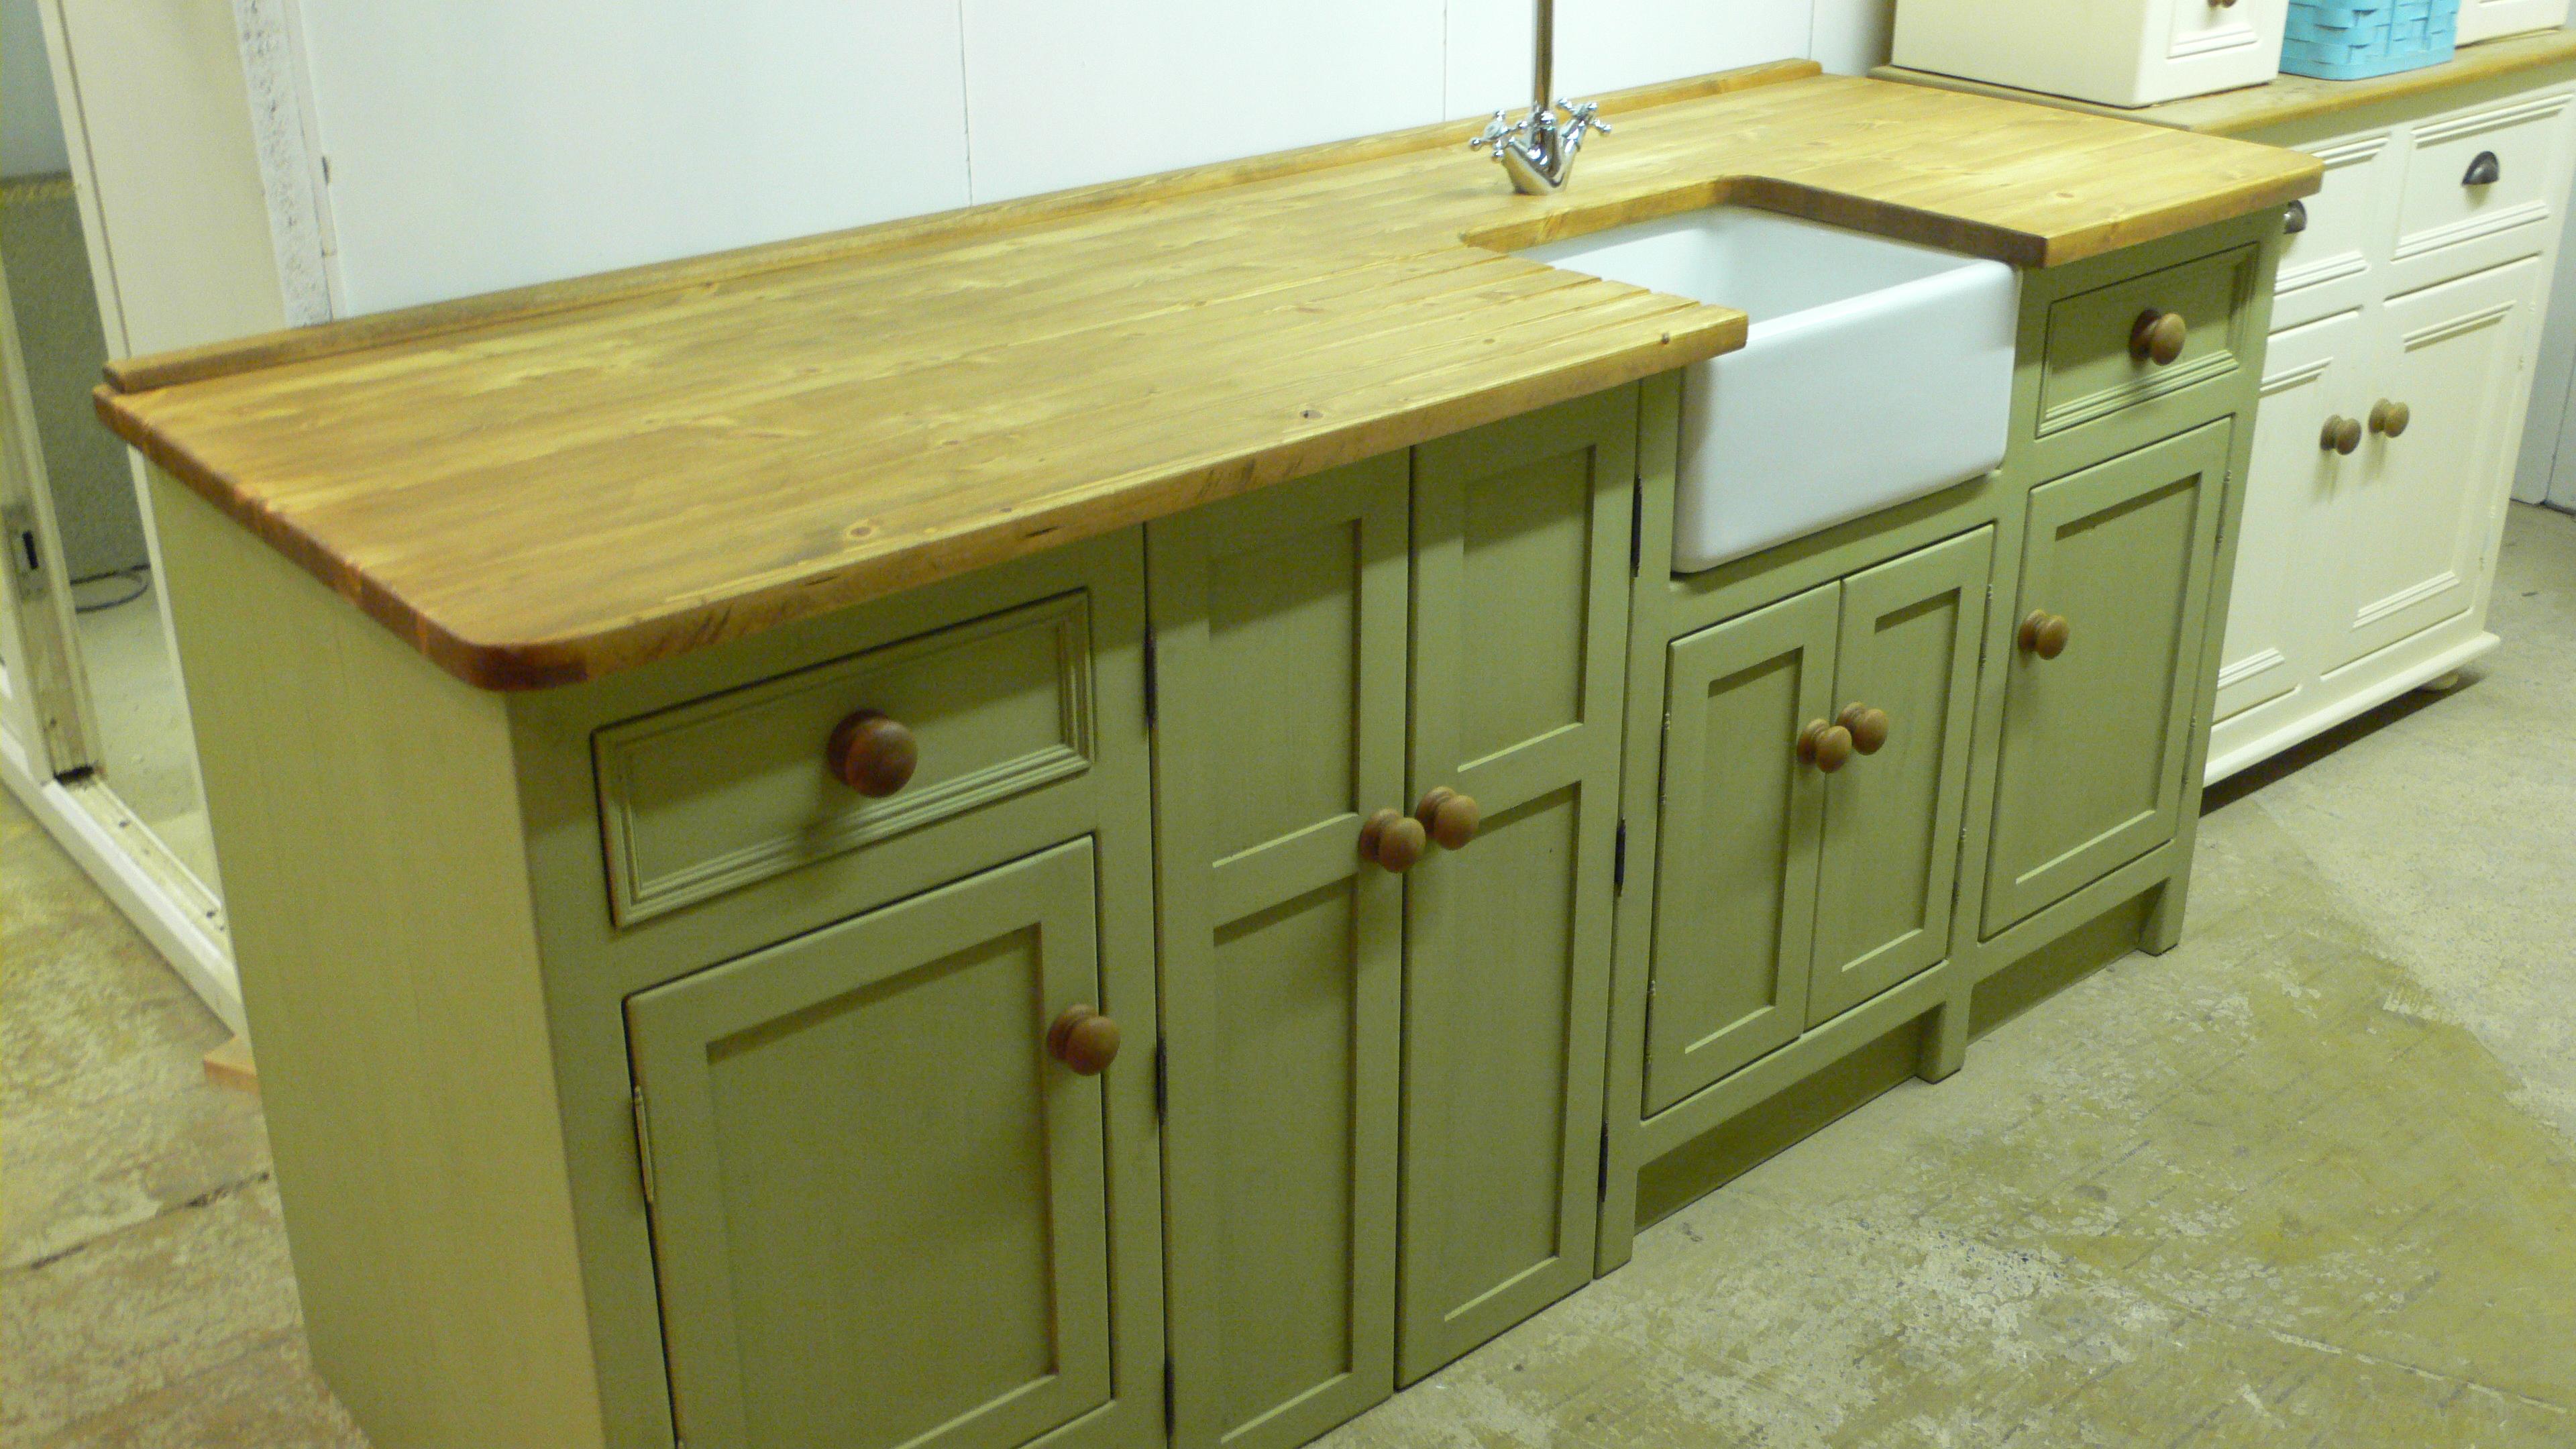 Mini Belfast Appliance Unit The Olive Branch Kitchens Ltd